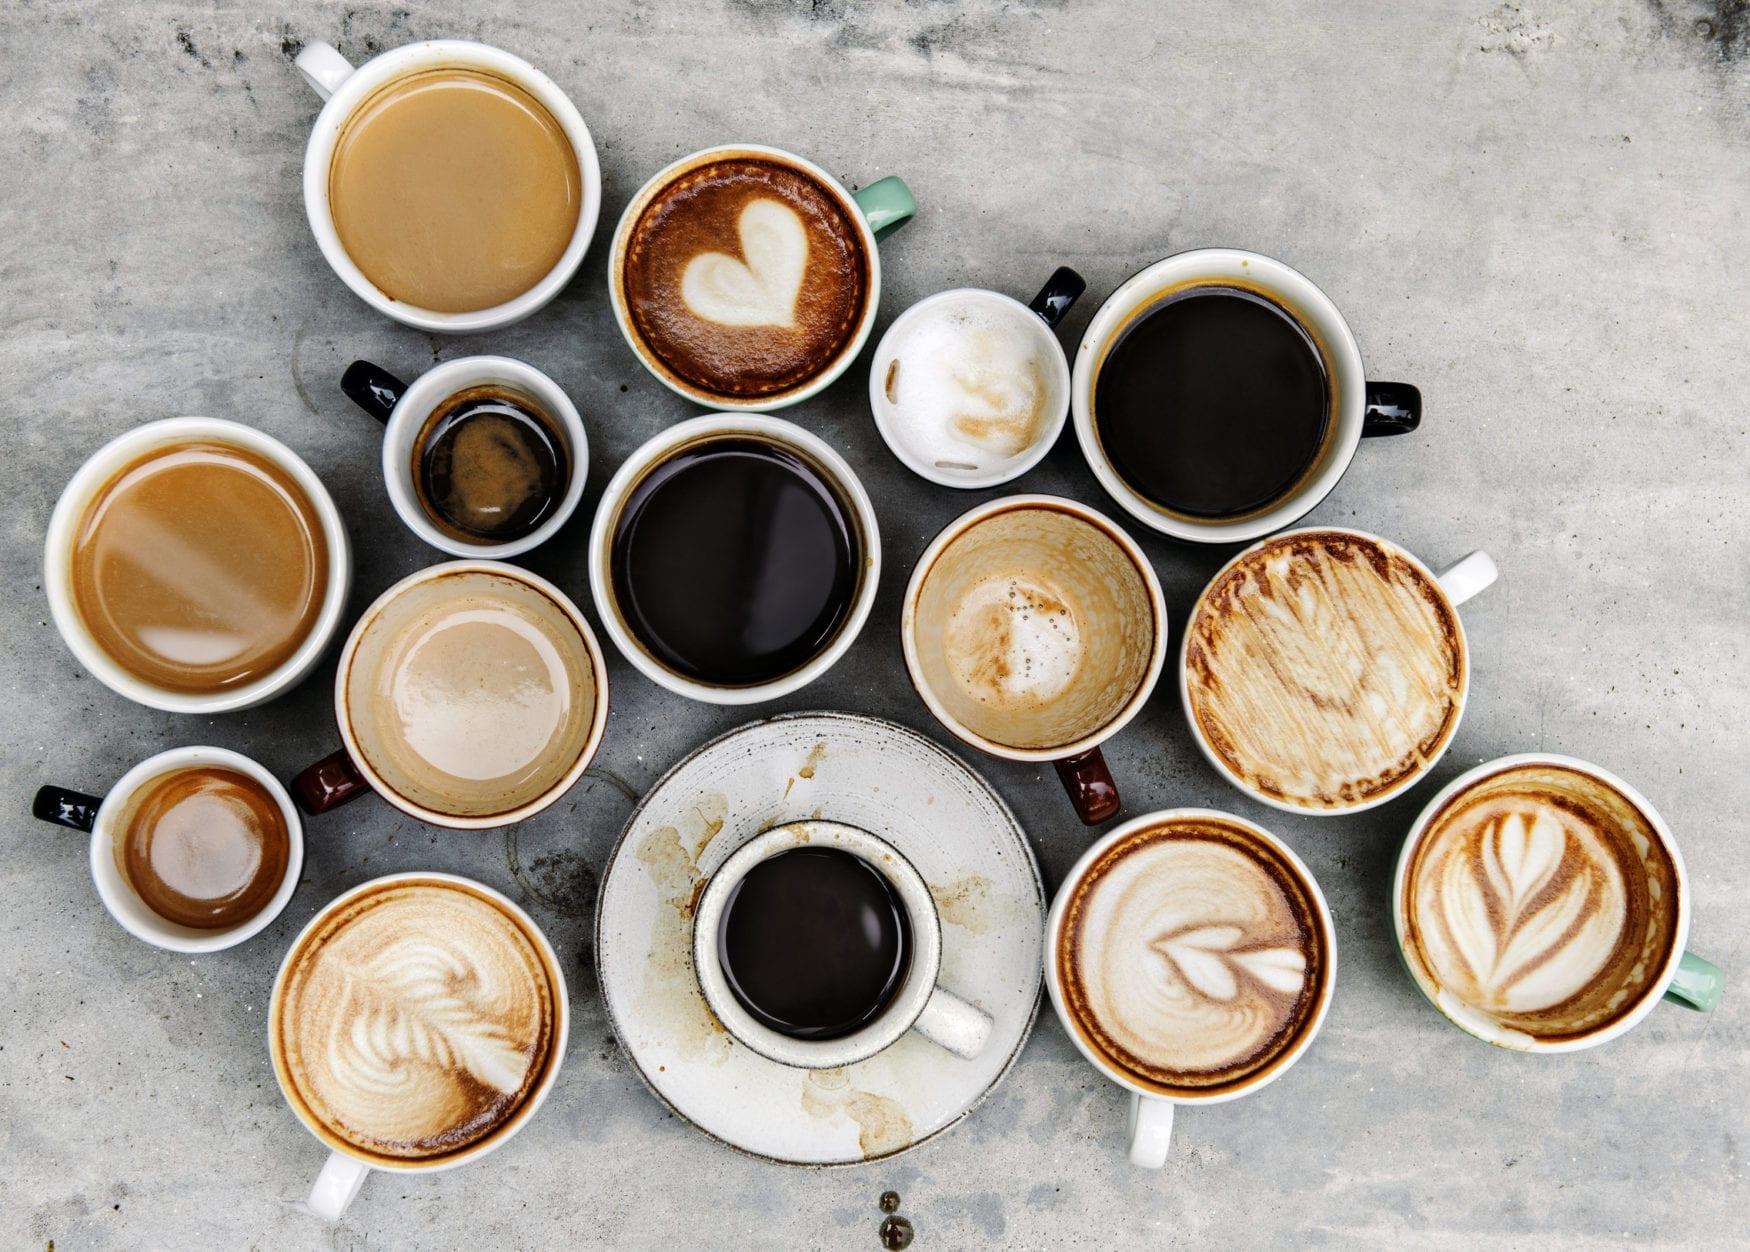 Tag des Kaffees 2019 - CafetierSuisse 1